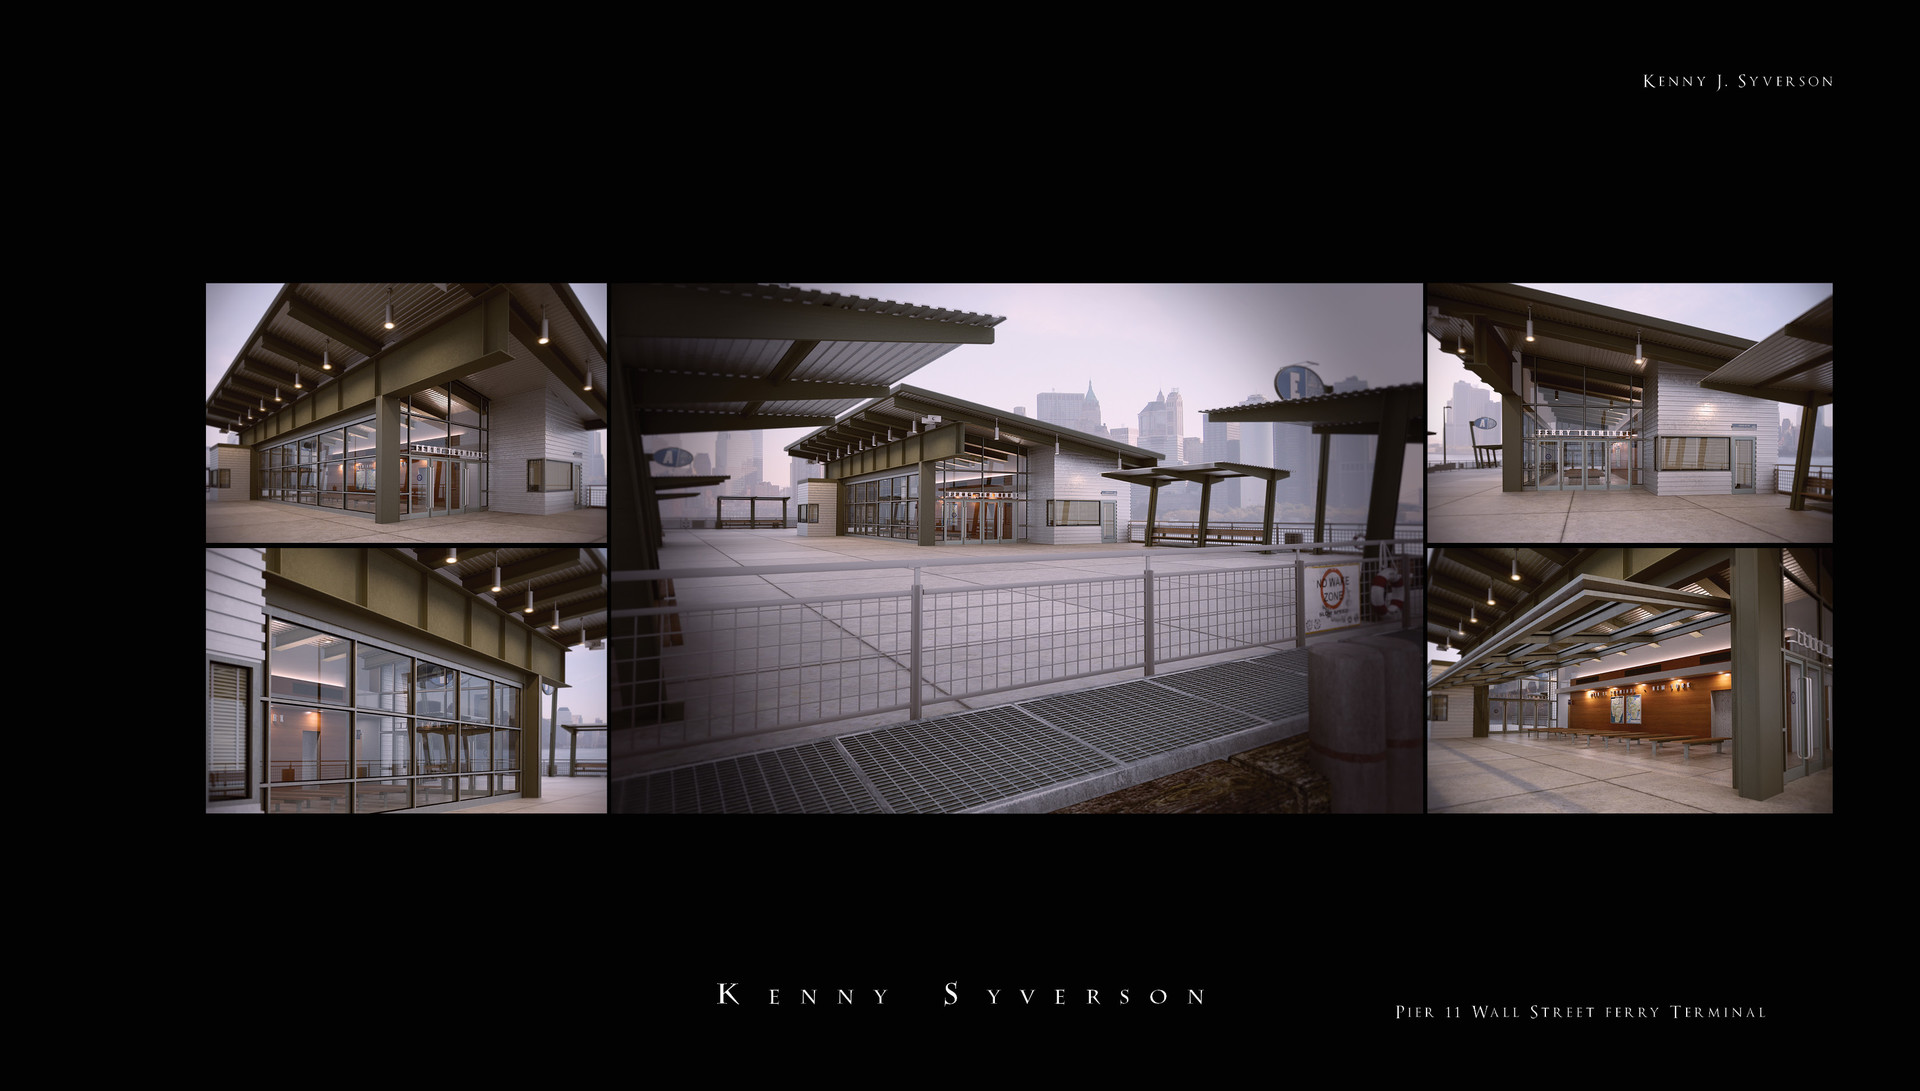 ArtStation - Pier 11 Ferry Terminal, Kenny Syverson